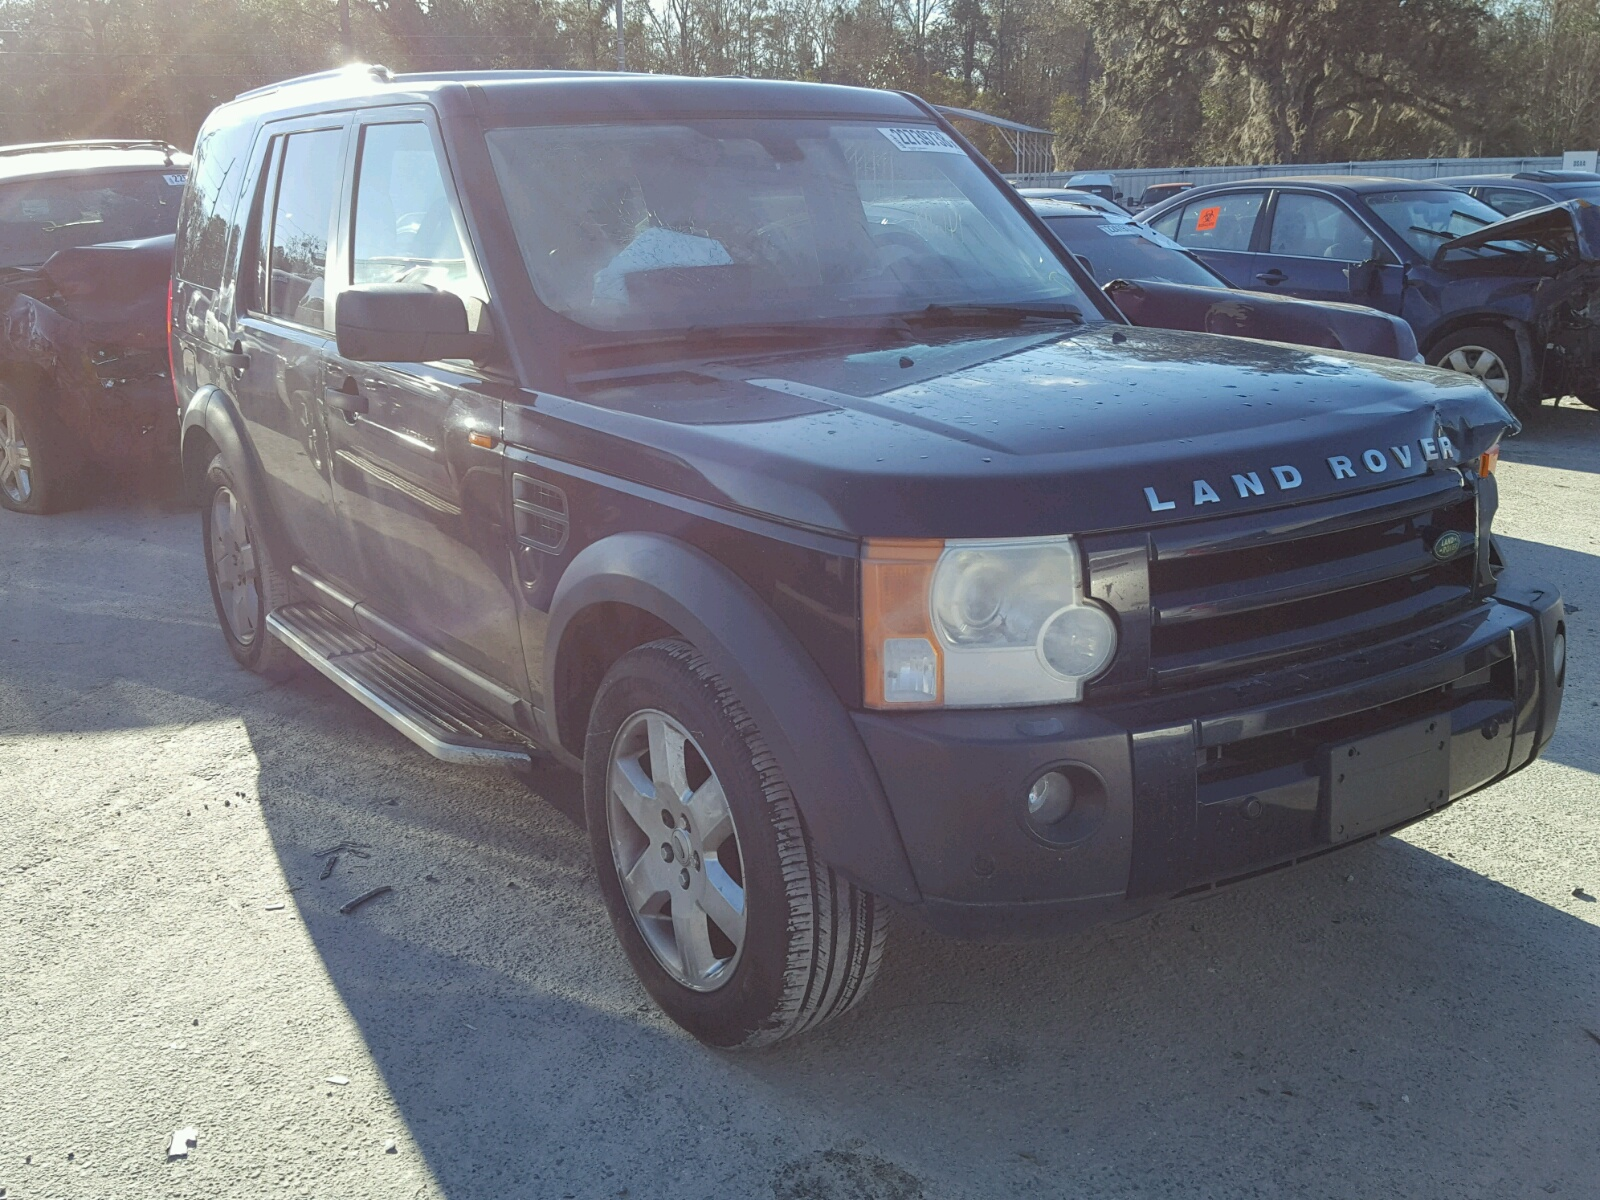 auction landrover en copart sale auctions on lot rover auto carfinder hayward for ended junk ca hse land online se receipt vin